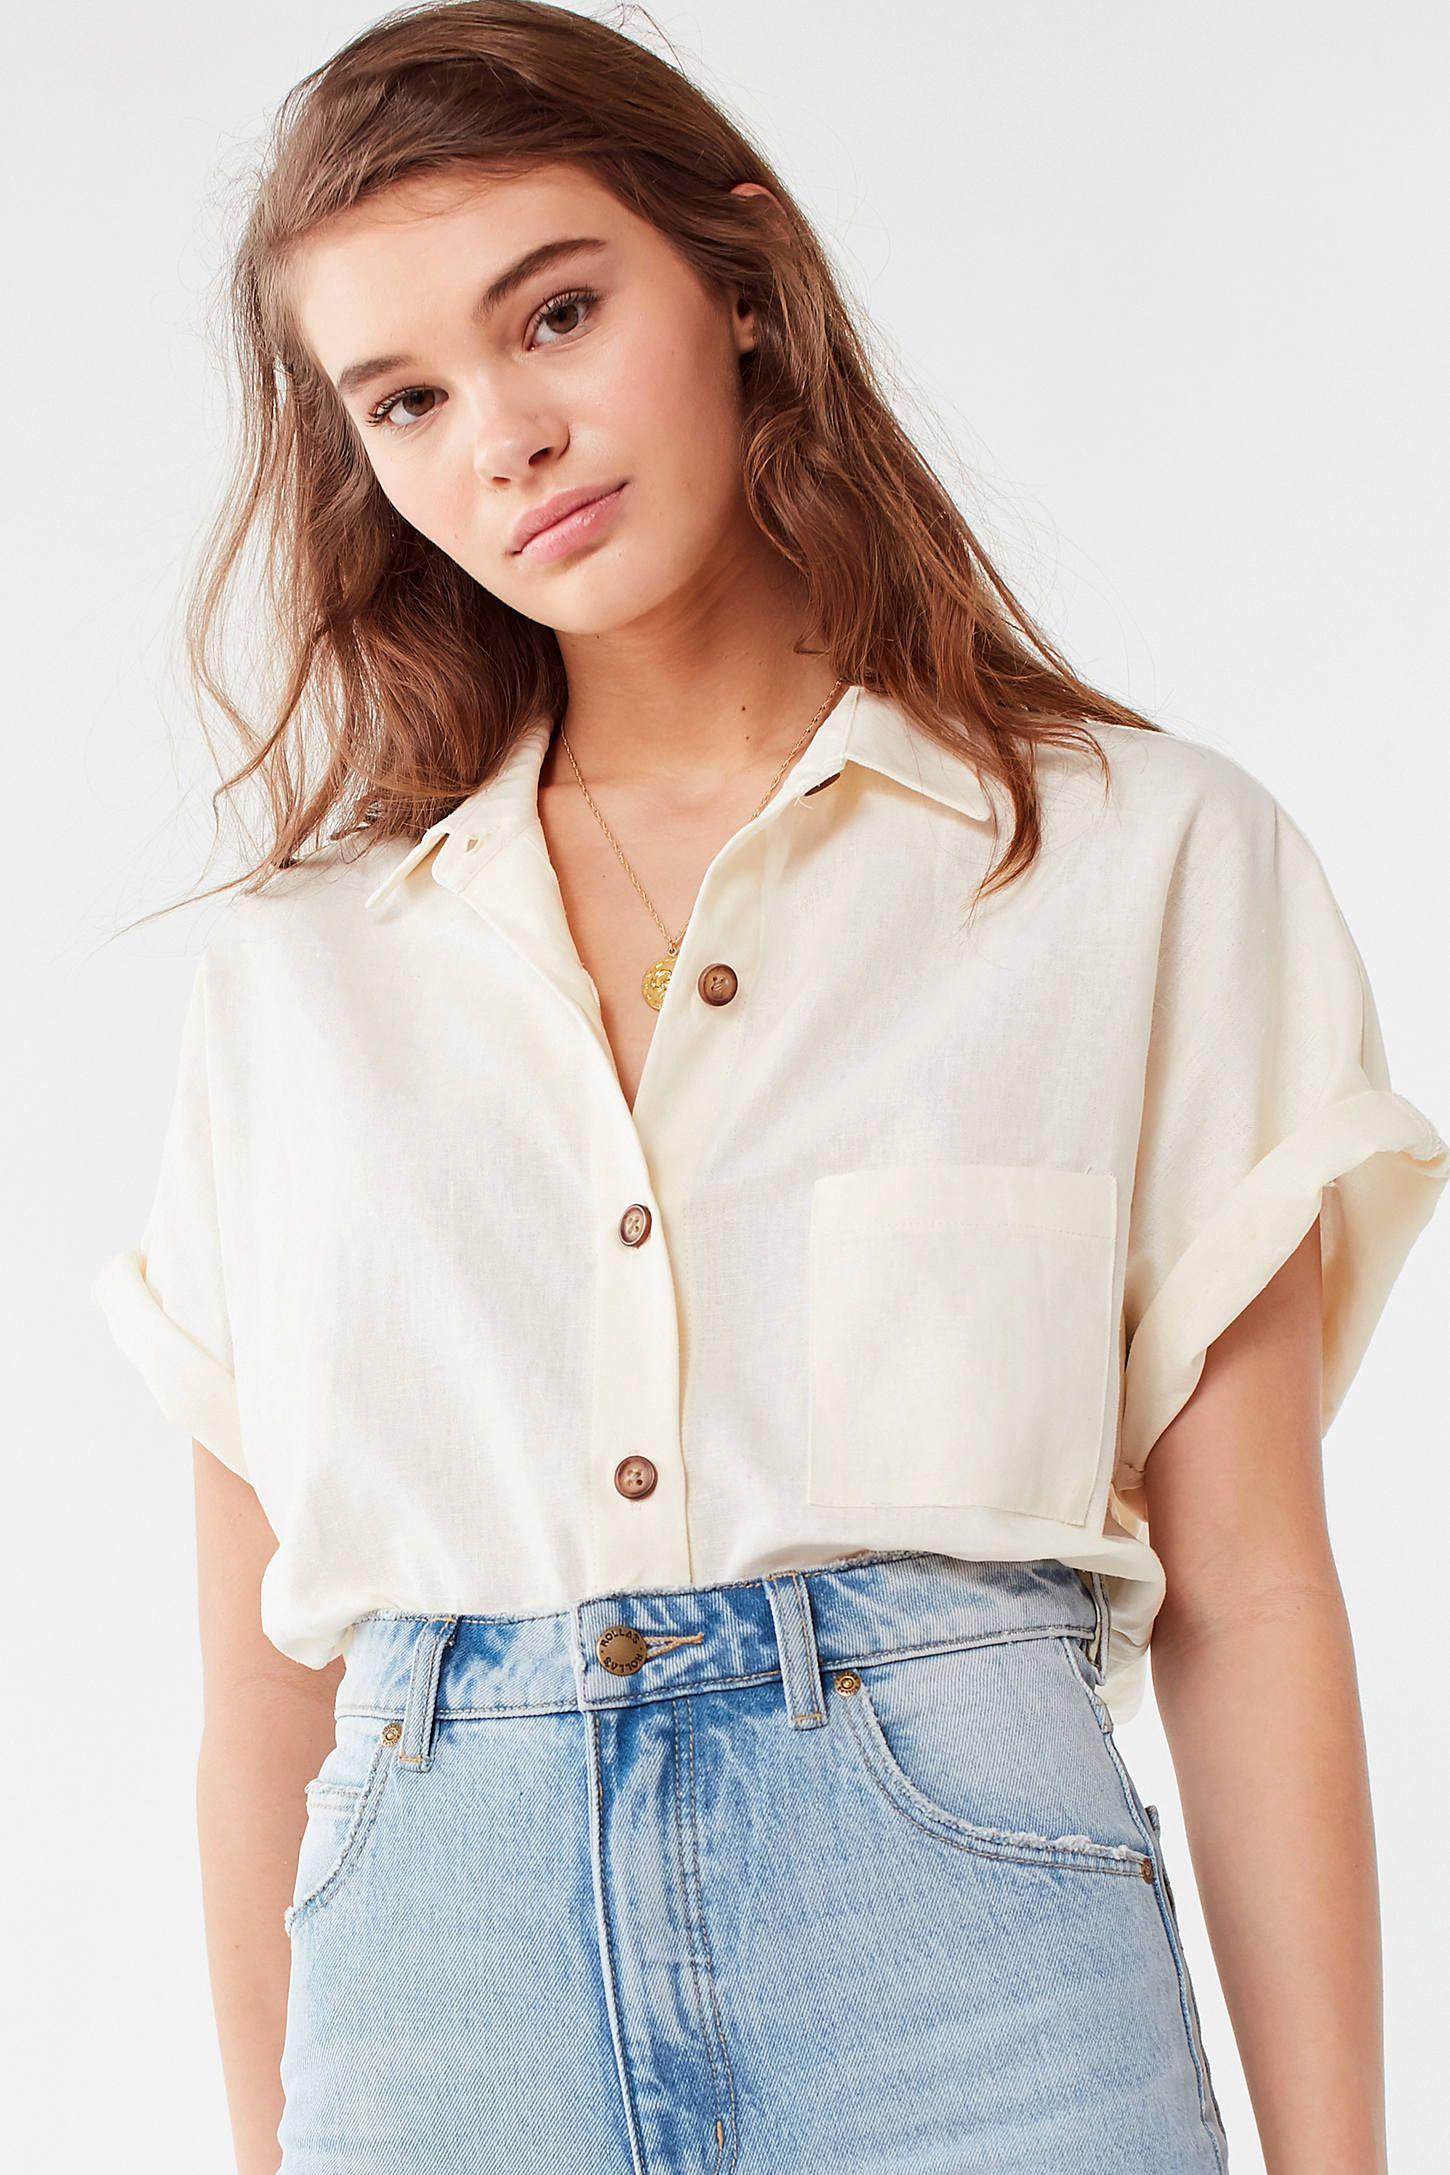 05471362 Urban Renewal Remnants Linen Button-Down Shirt in 2019 | Wishing ...